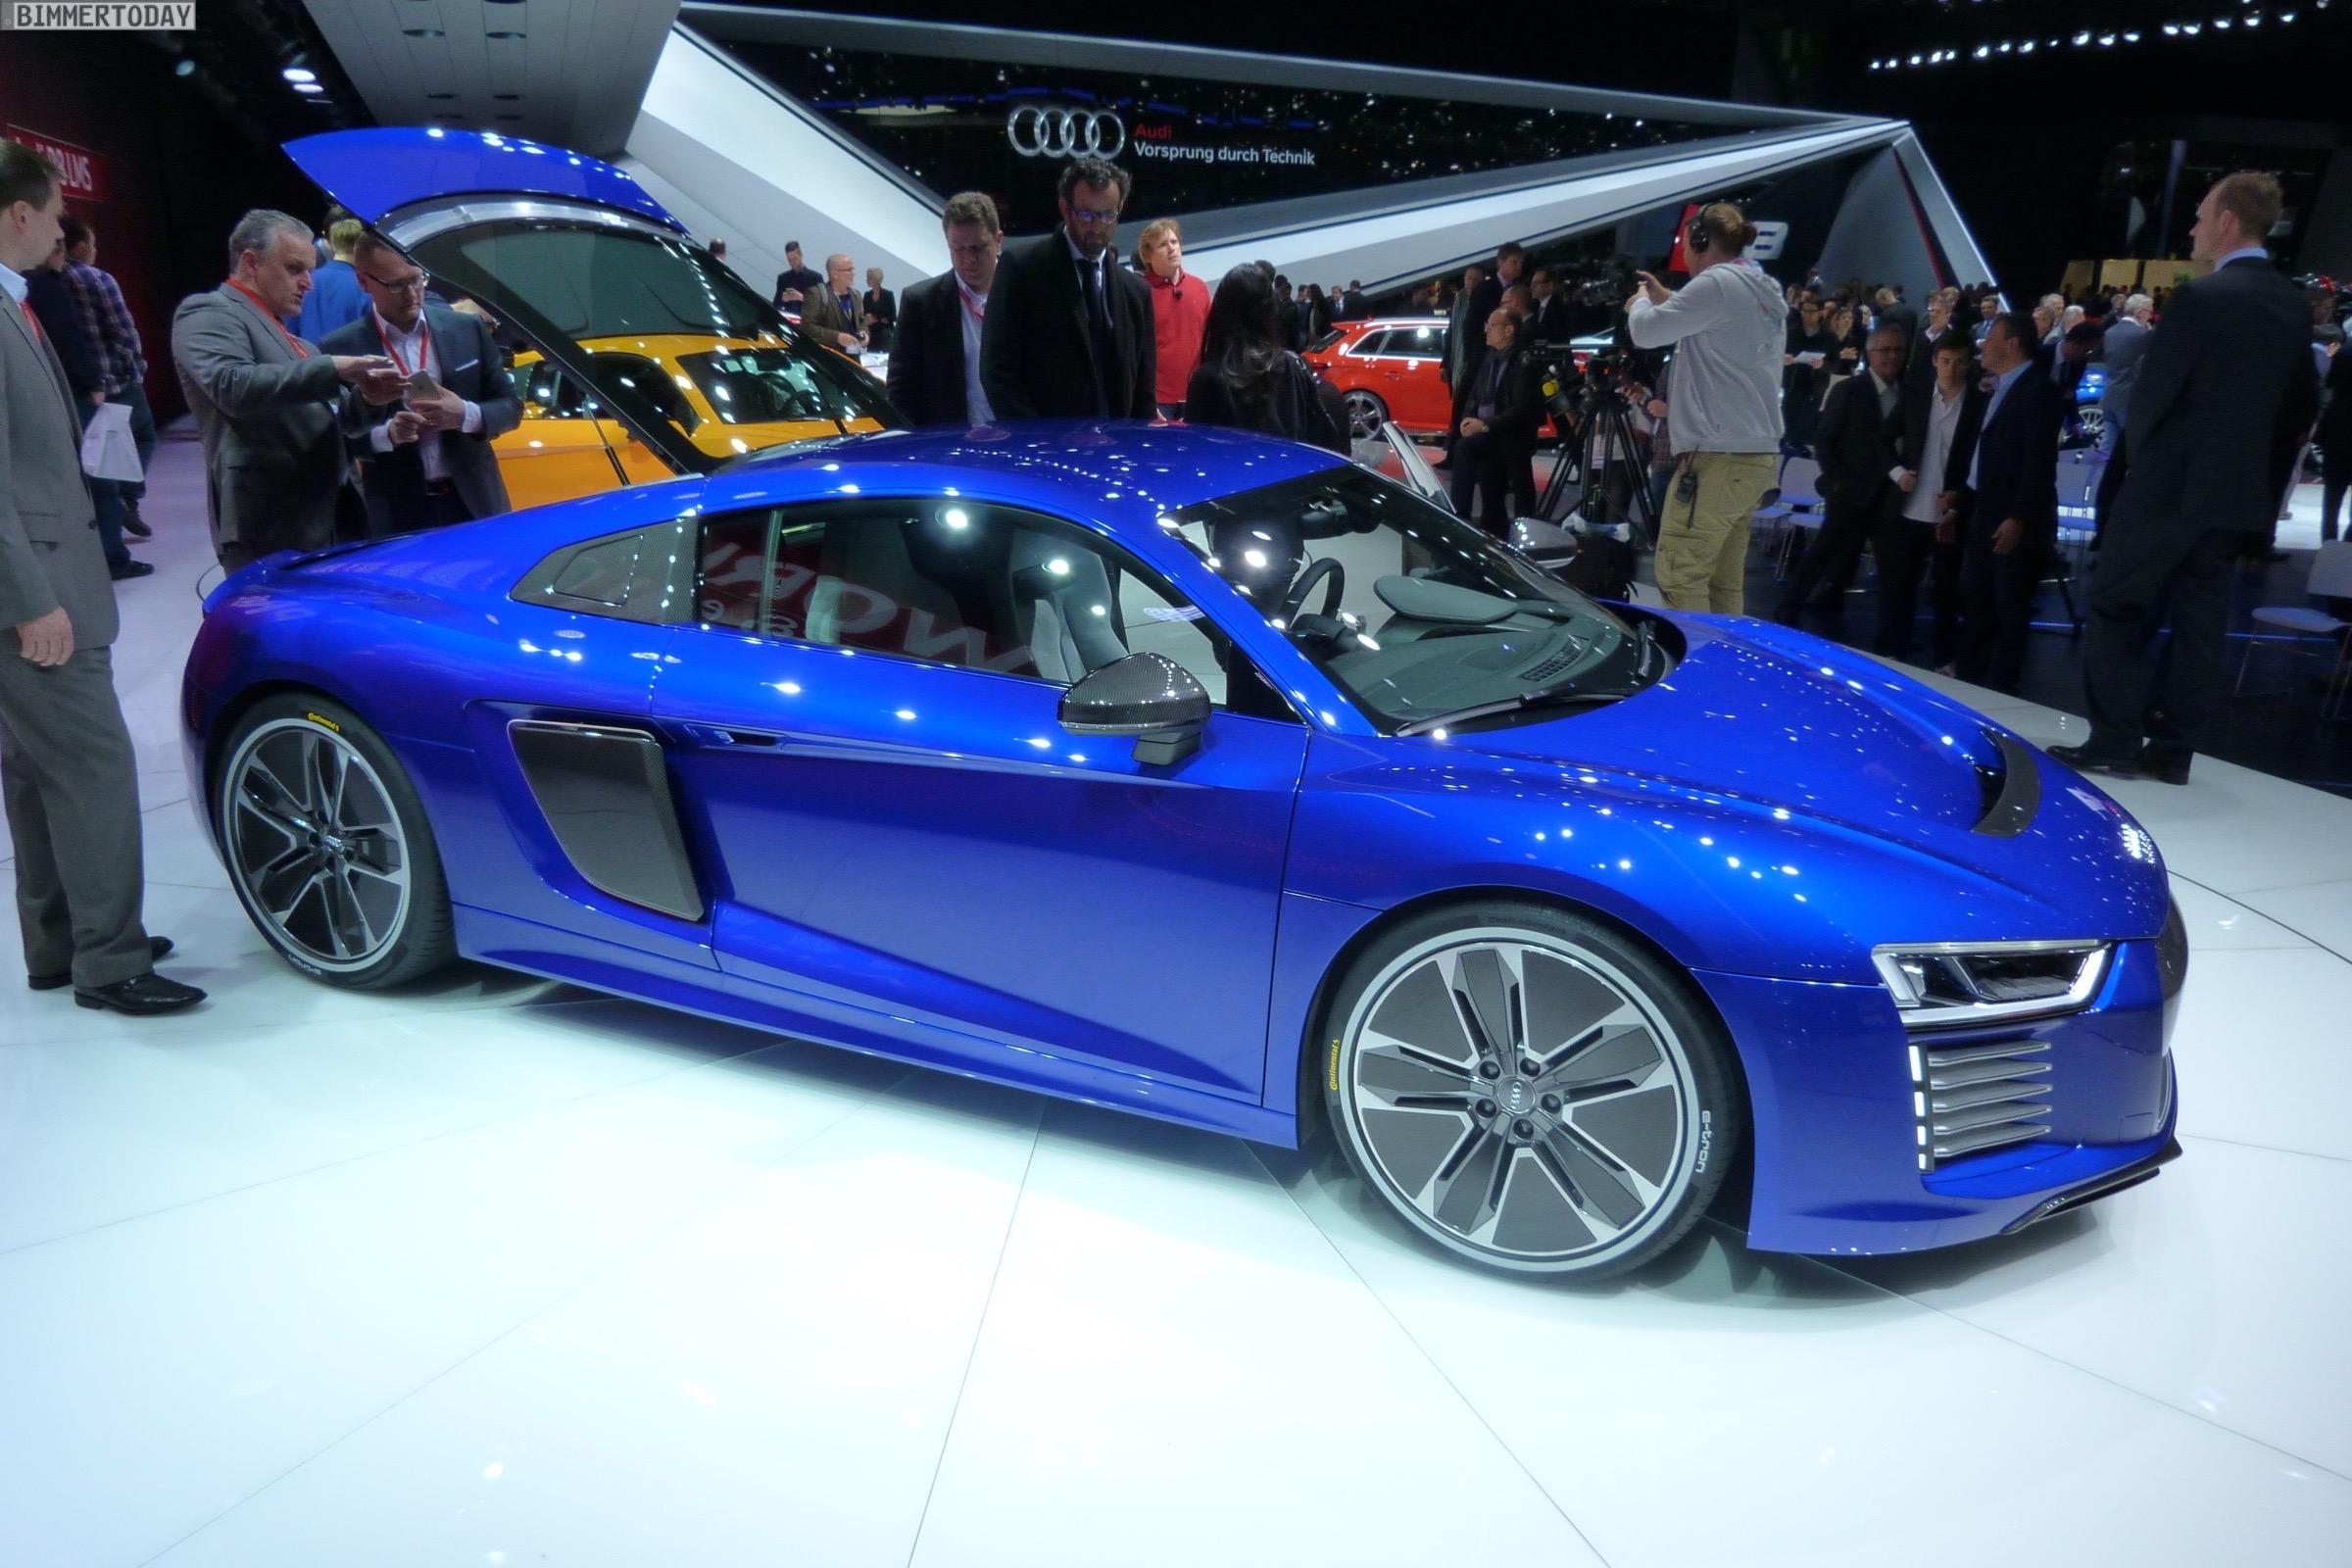 Audi R8 e tron 2015 Genf Autosalon Live 13